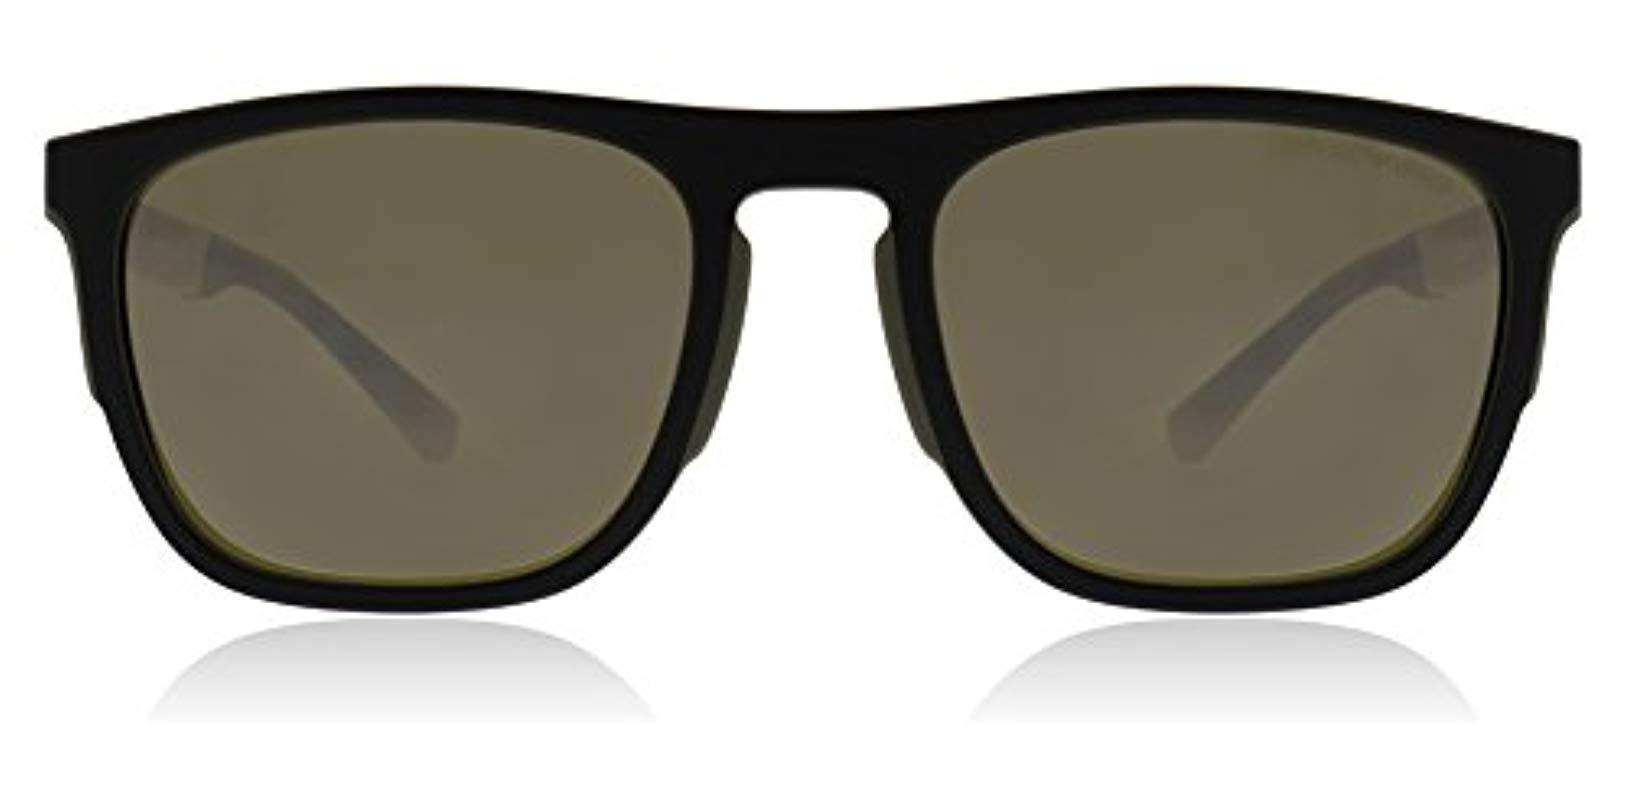 726056cb19 Ray ban ea sunglasses matte olive jpg 1626x800 Olive mirrored aviators